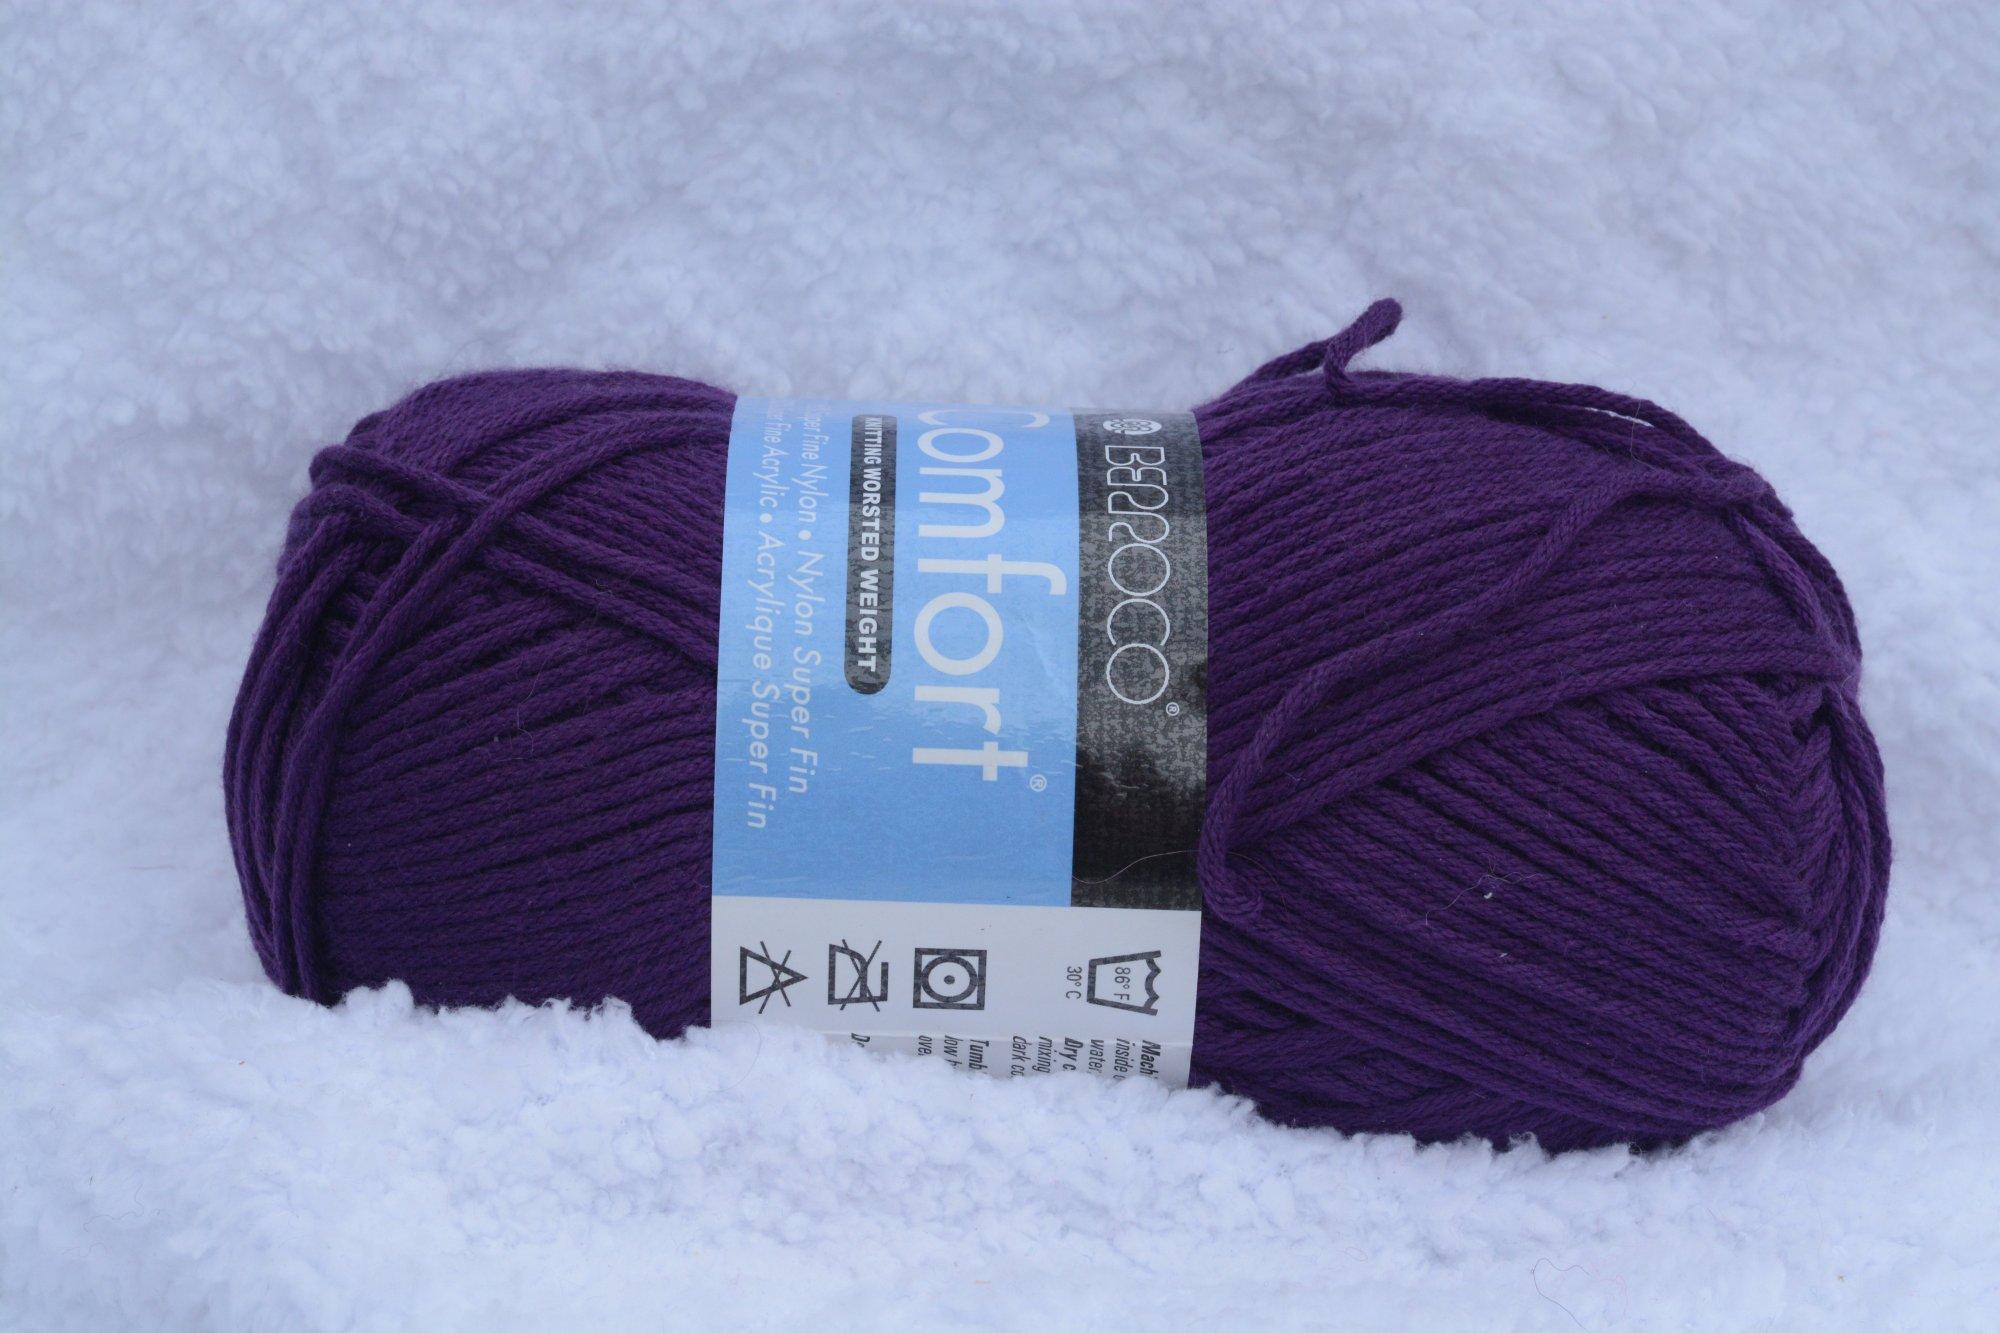 Comfort Worsted - 9722 - Purple